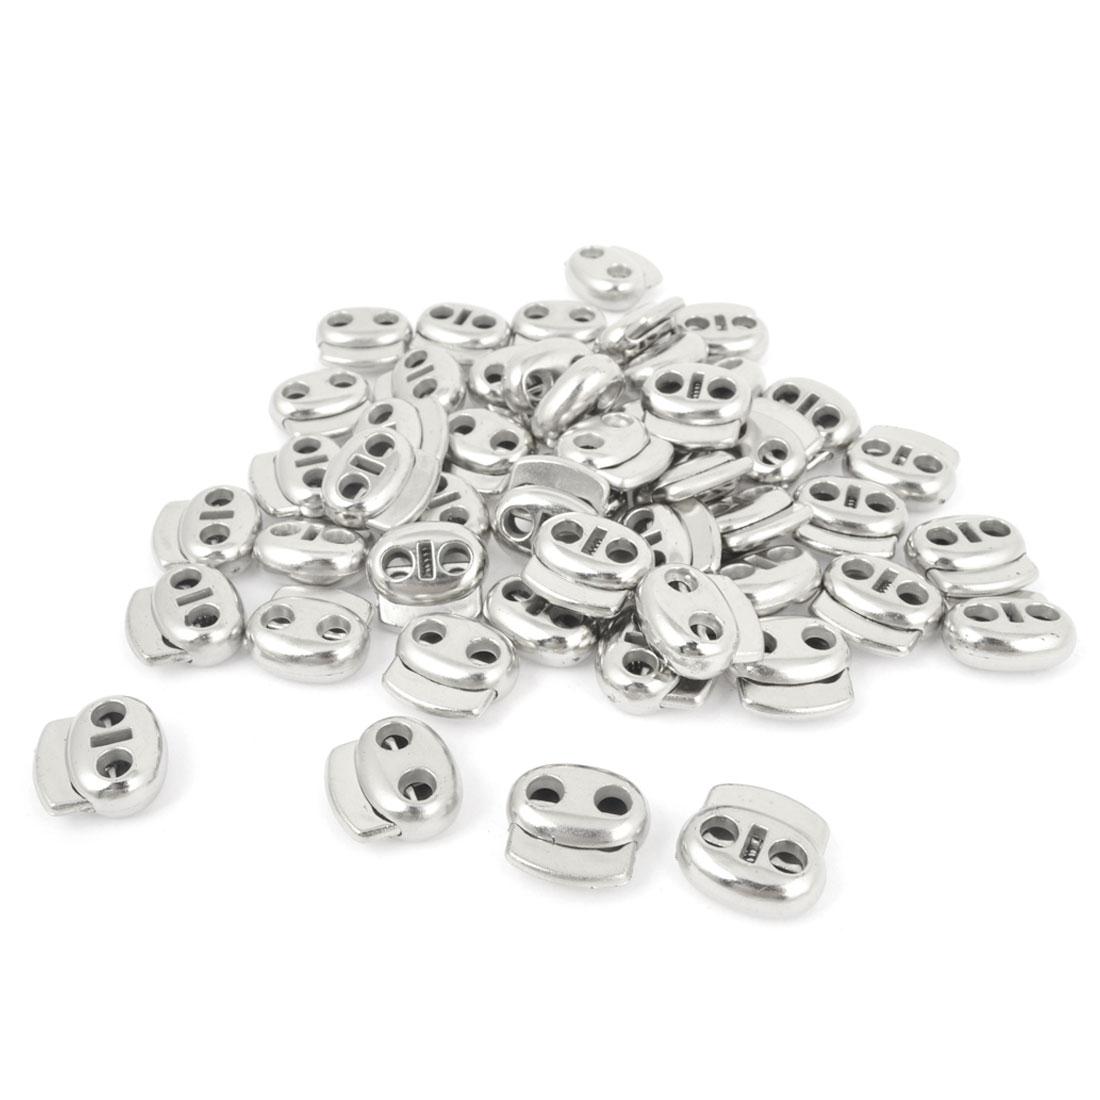 Silver Tone 4.5mm Dia Two Holes Spring Lanyard Cord Locks Toggles 50 Pcs